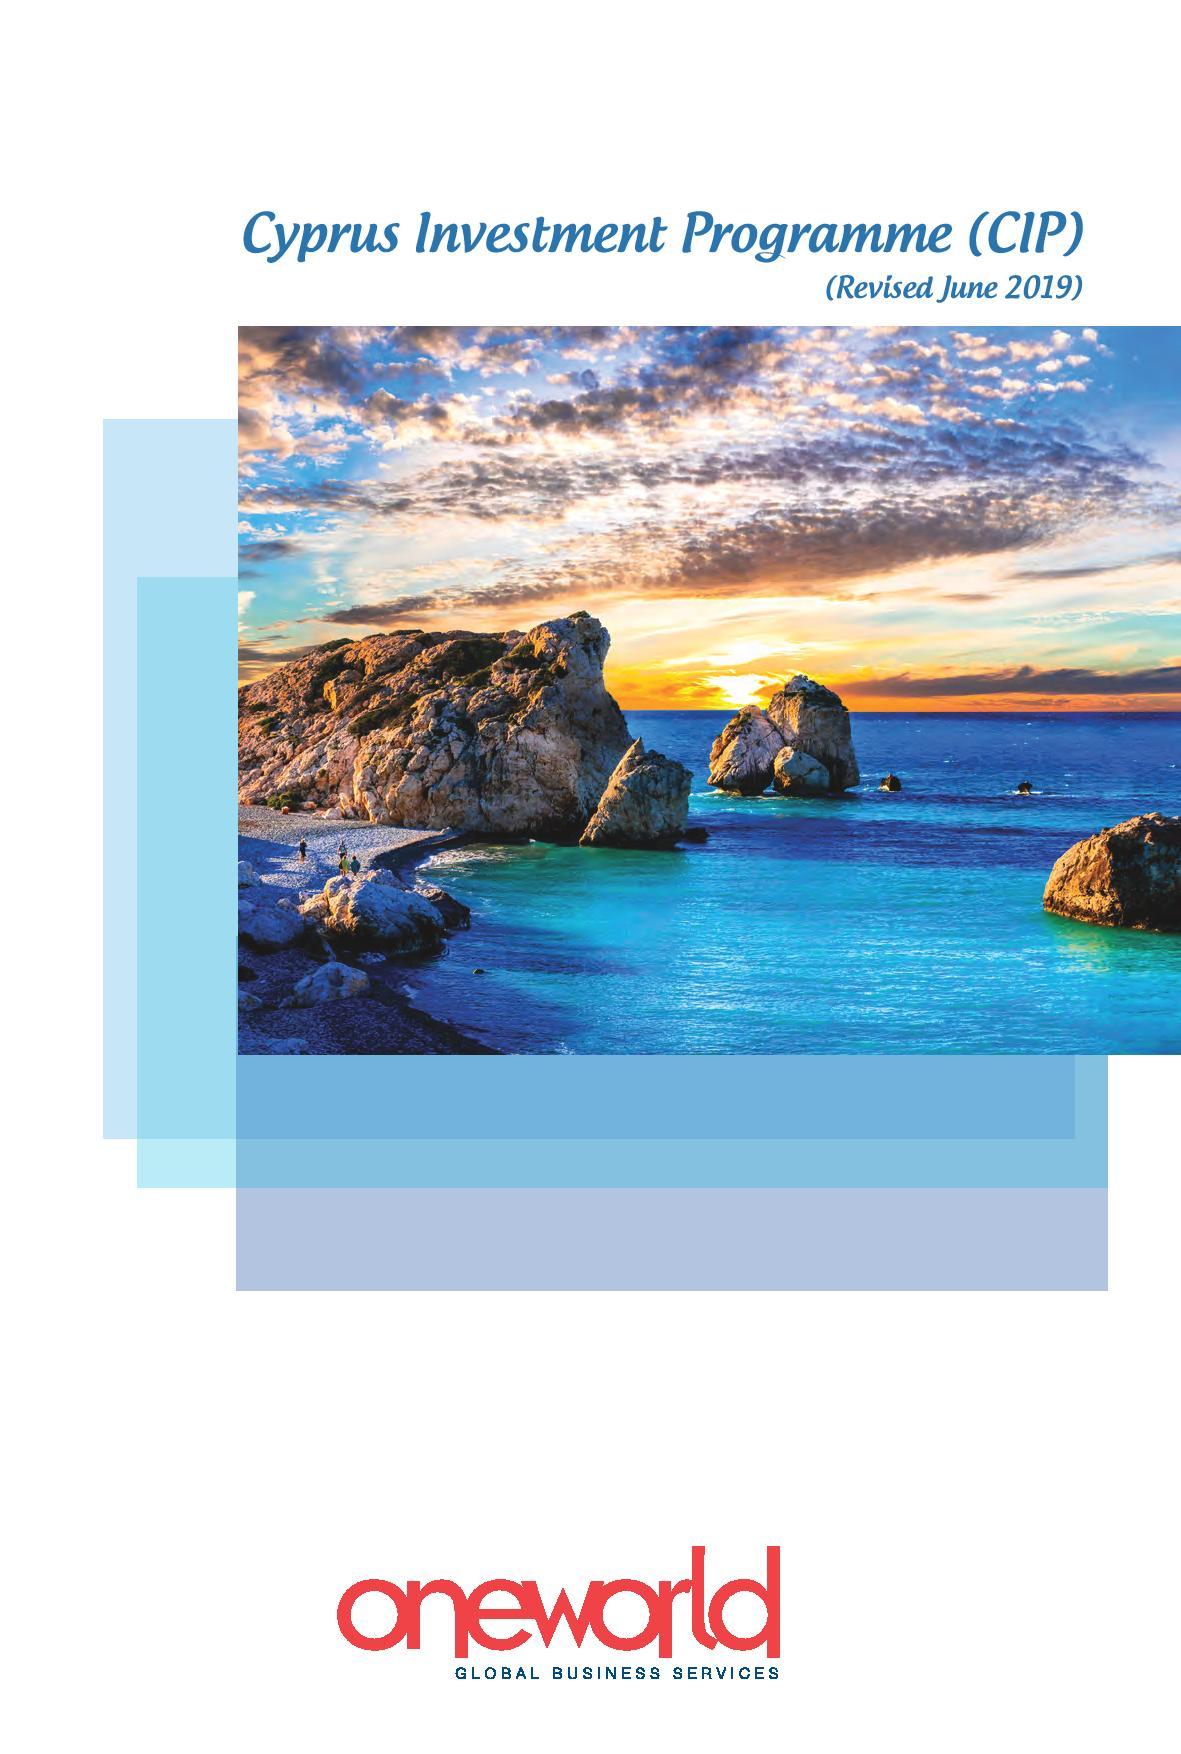 Oneworld Ltd:  Cyprus Investment Programme (CIP) (Revised June 2019)